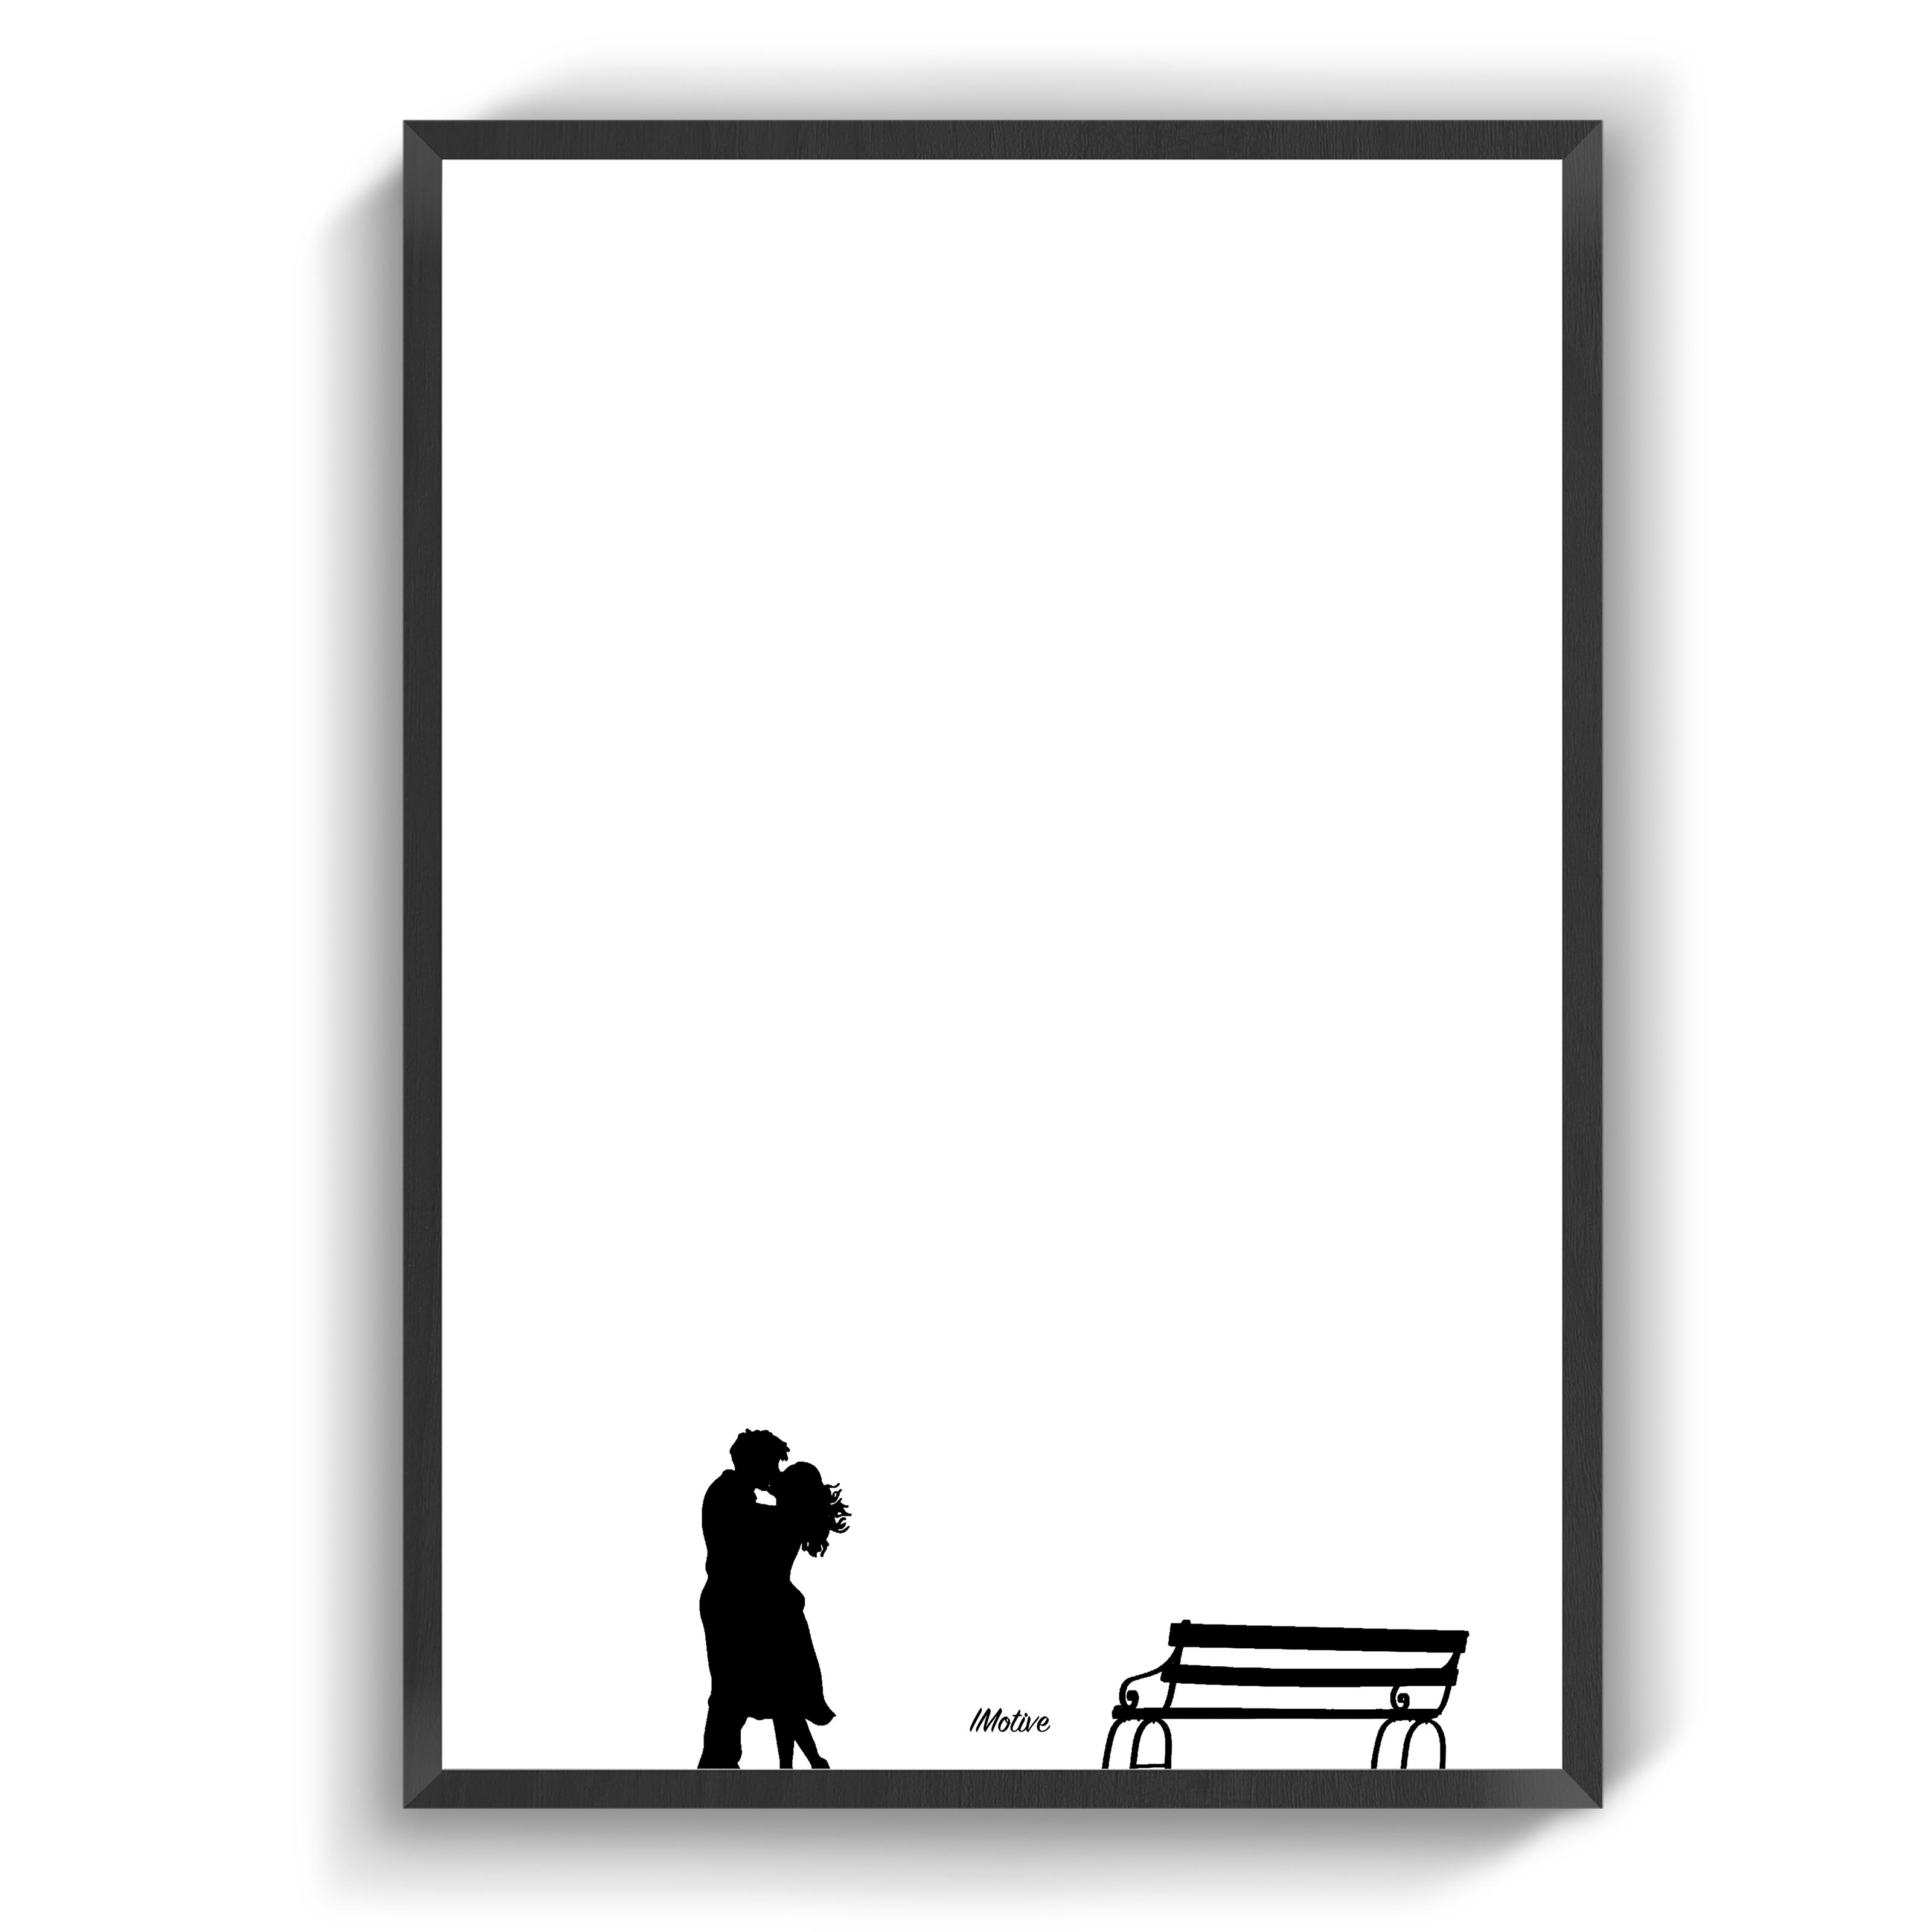 Kaerlighedsbaenken Plakater Sort Hvid Billeder